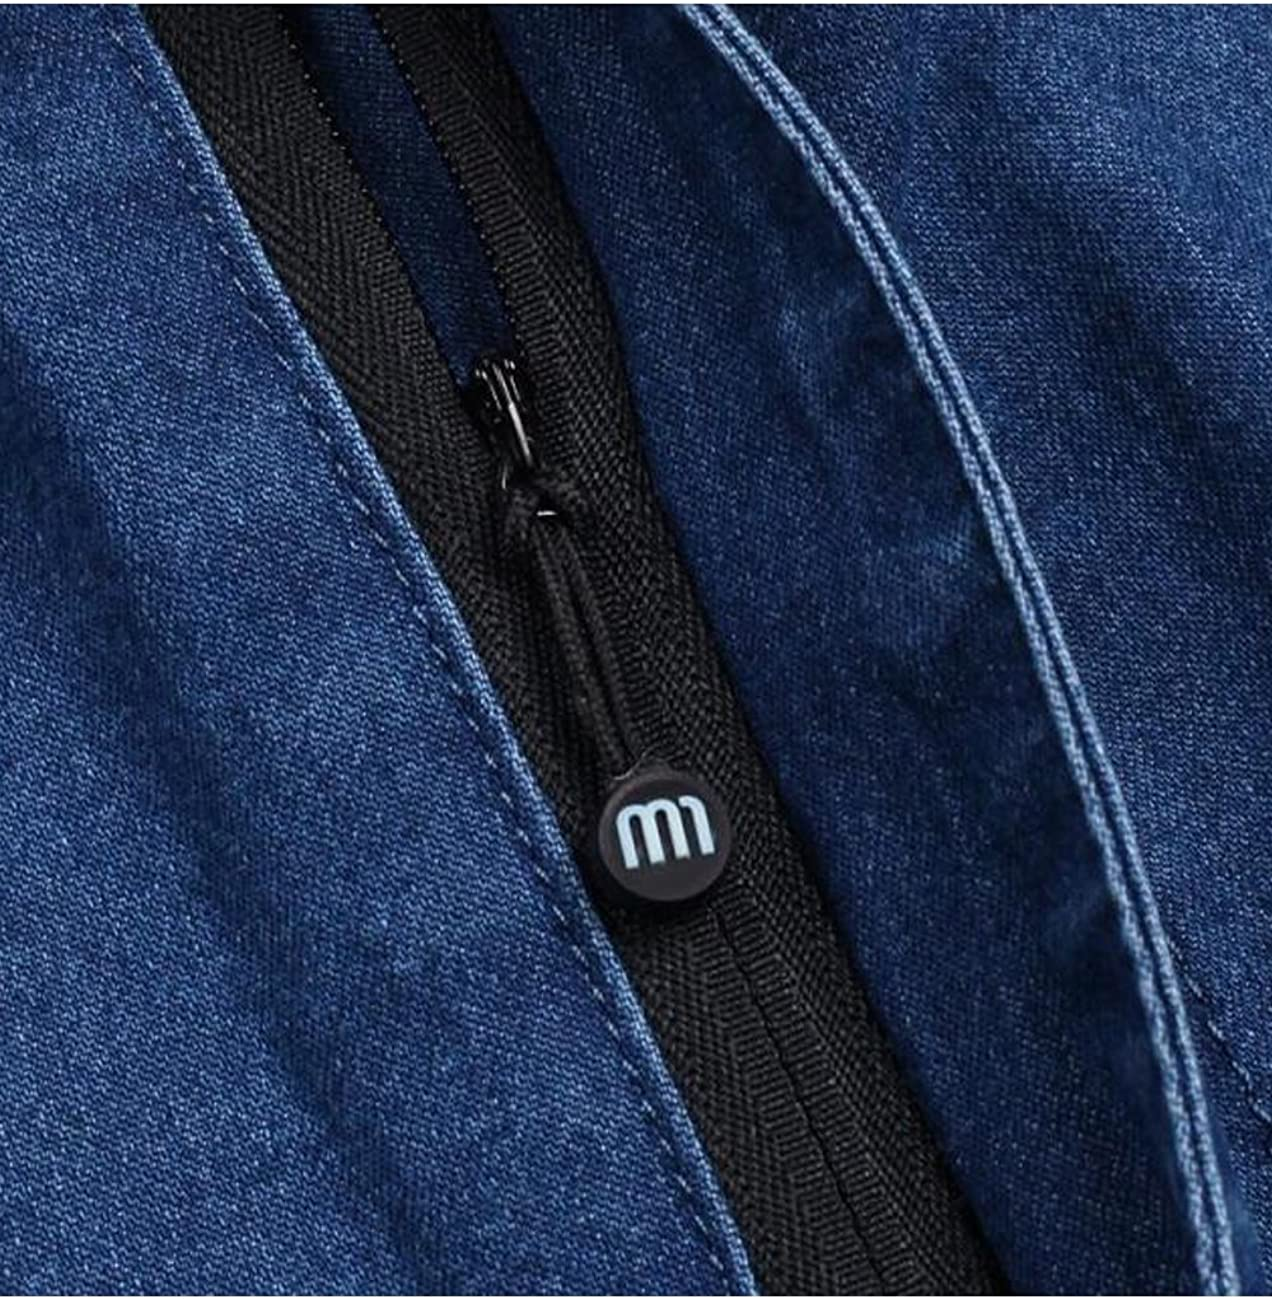 Zoulee Mens Full Elastic Waist Denim Pull On Jeans Straight Trousers Blue 36